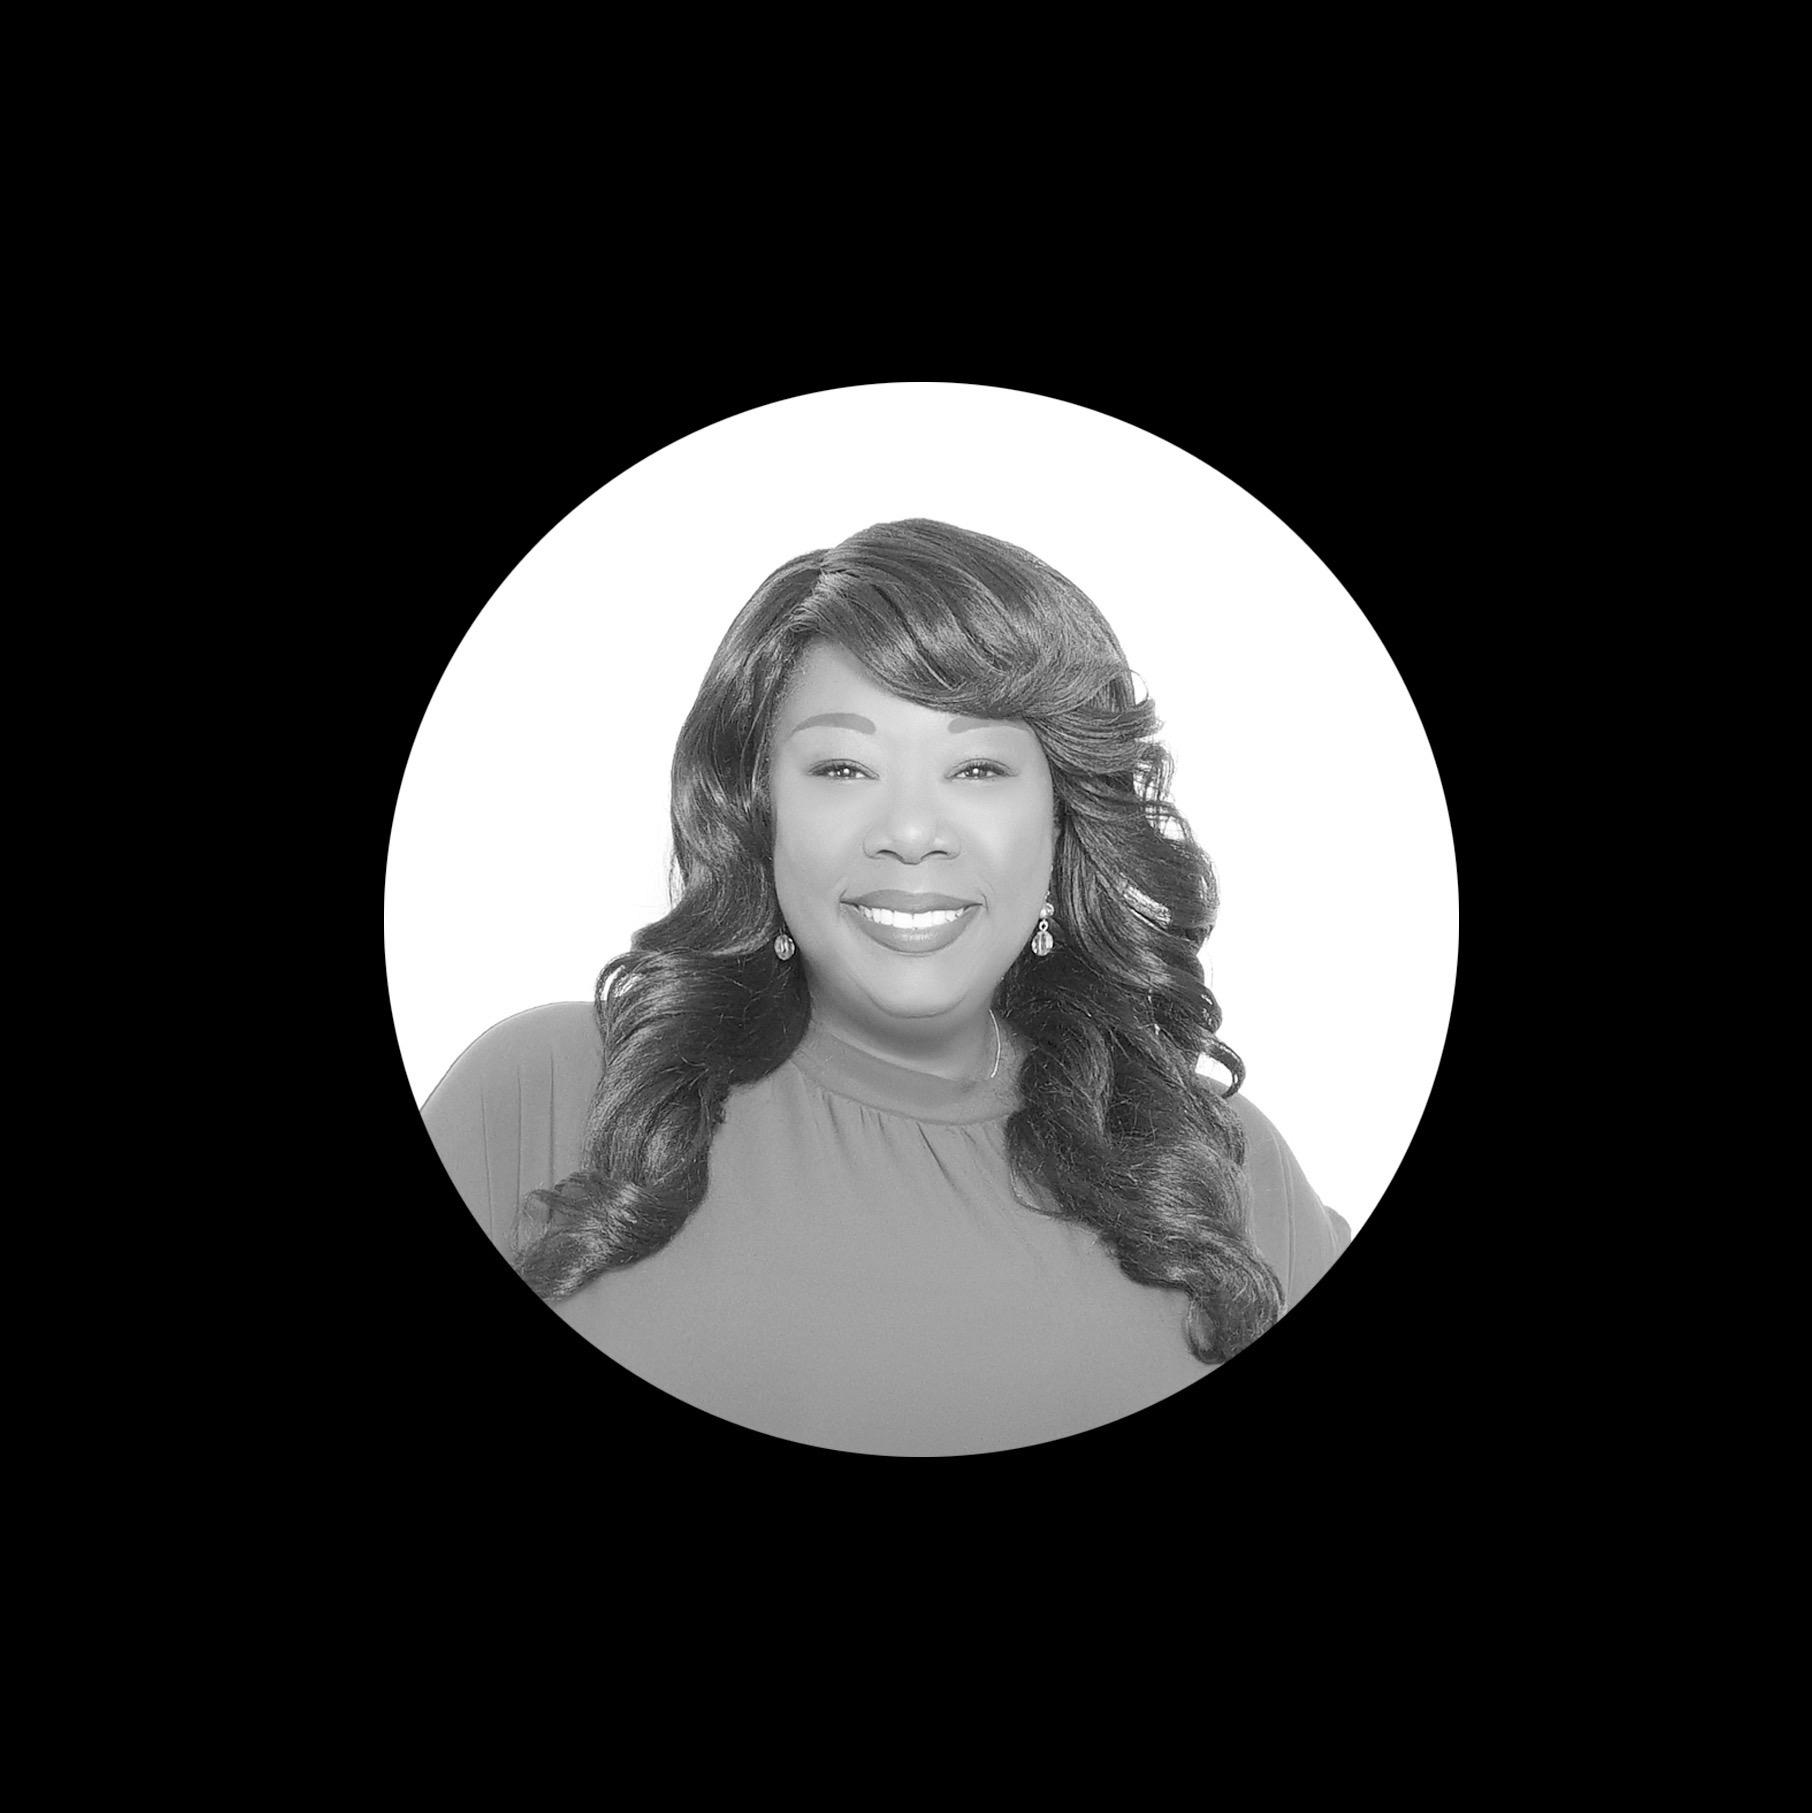 Executive Director / Co-Founder - Tonya Lewis